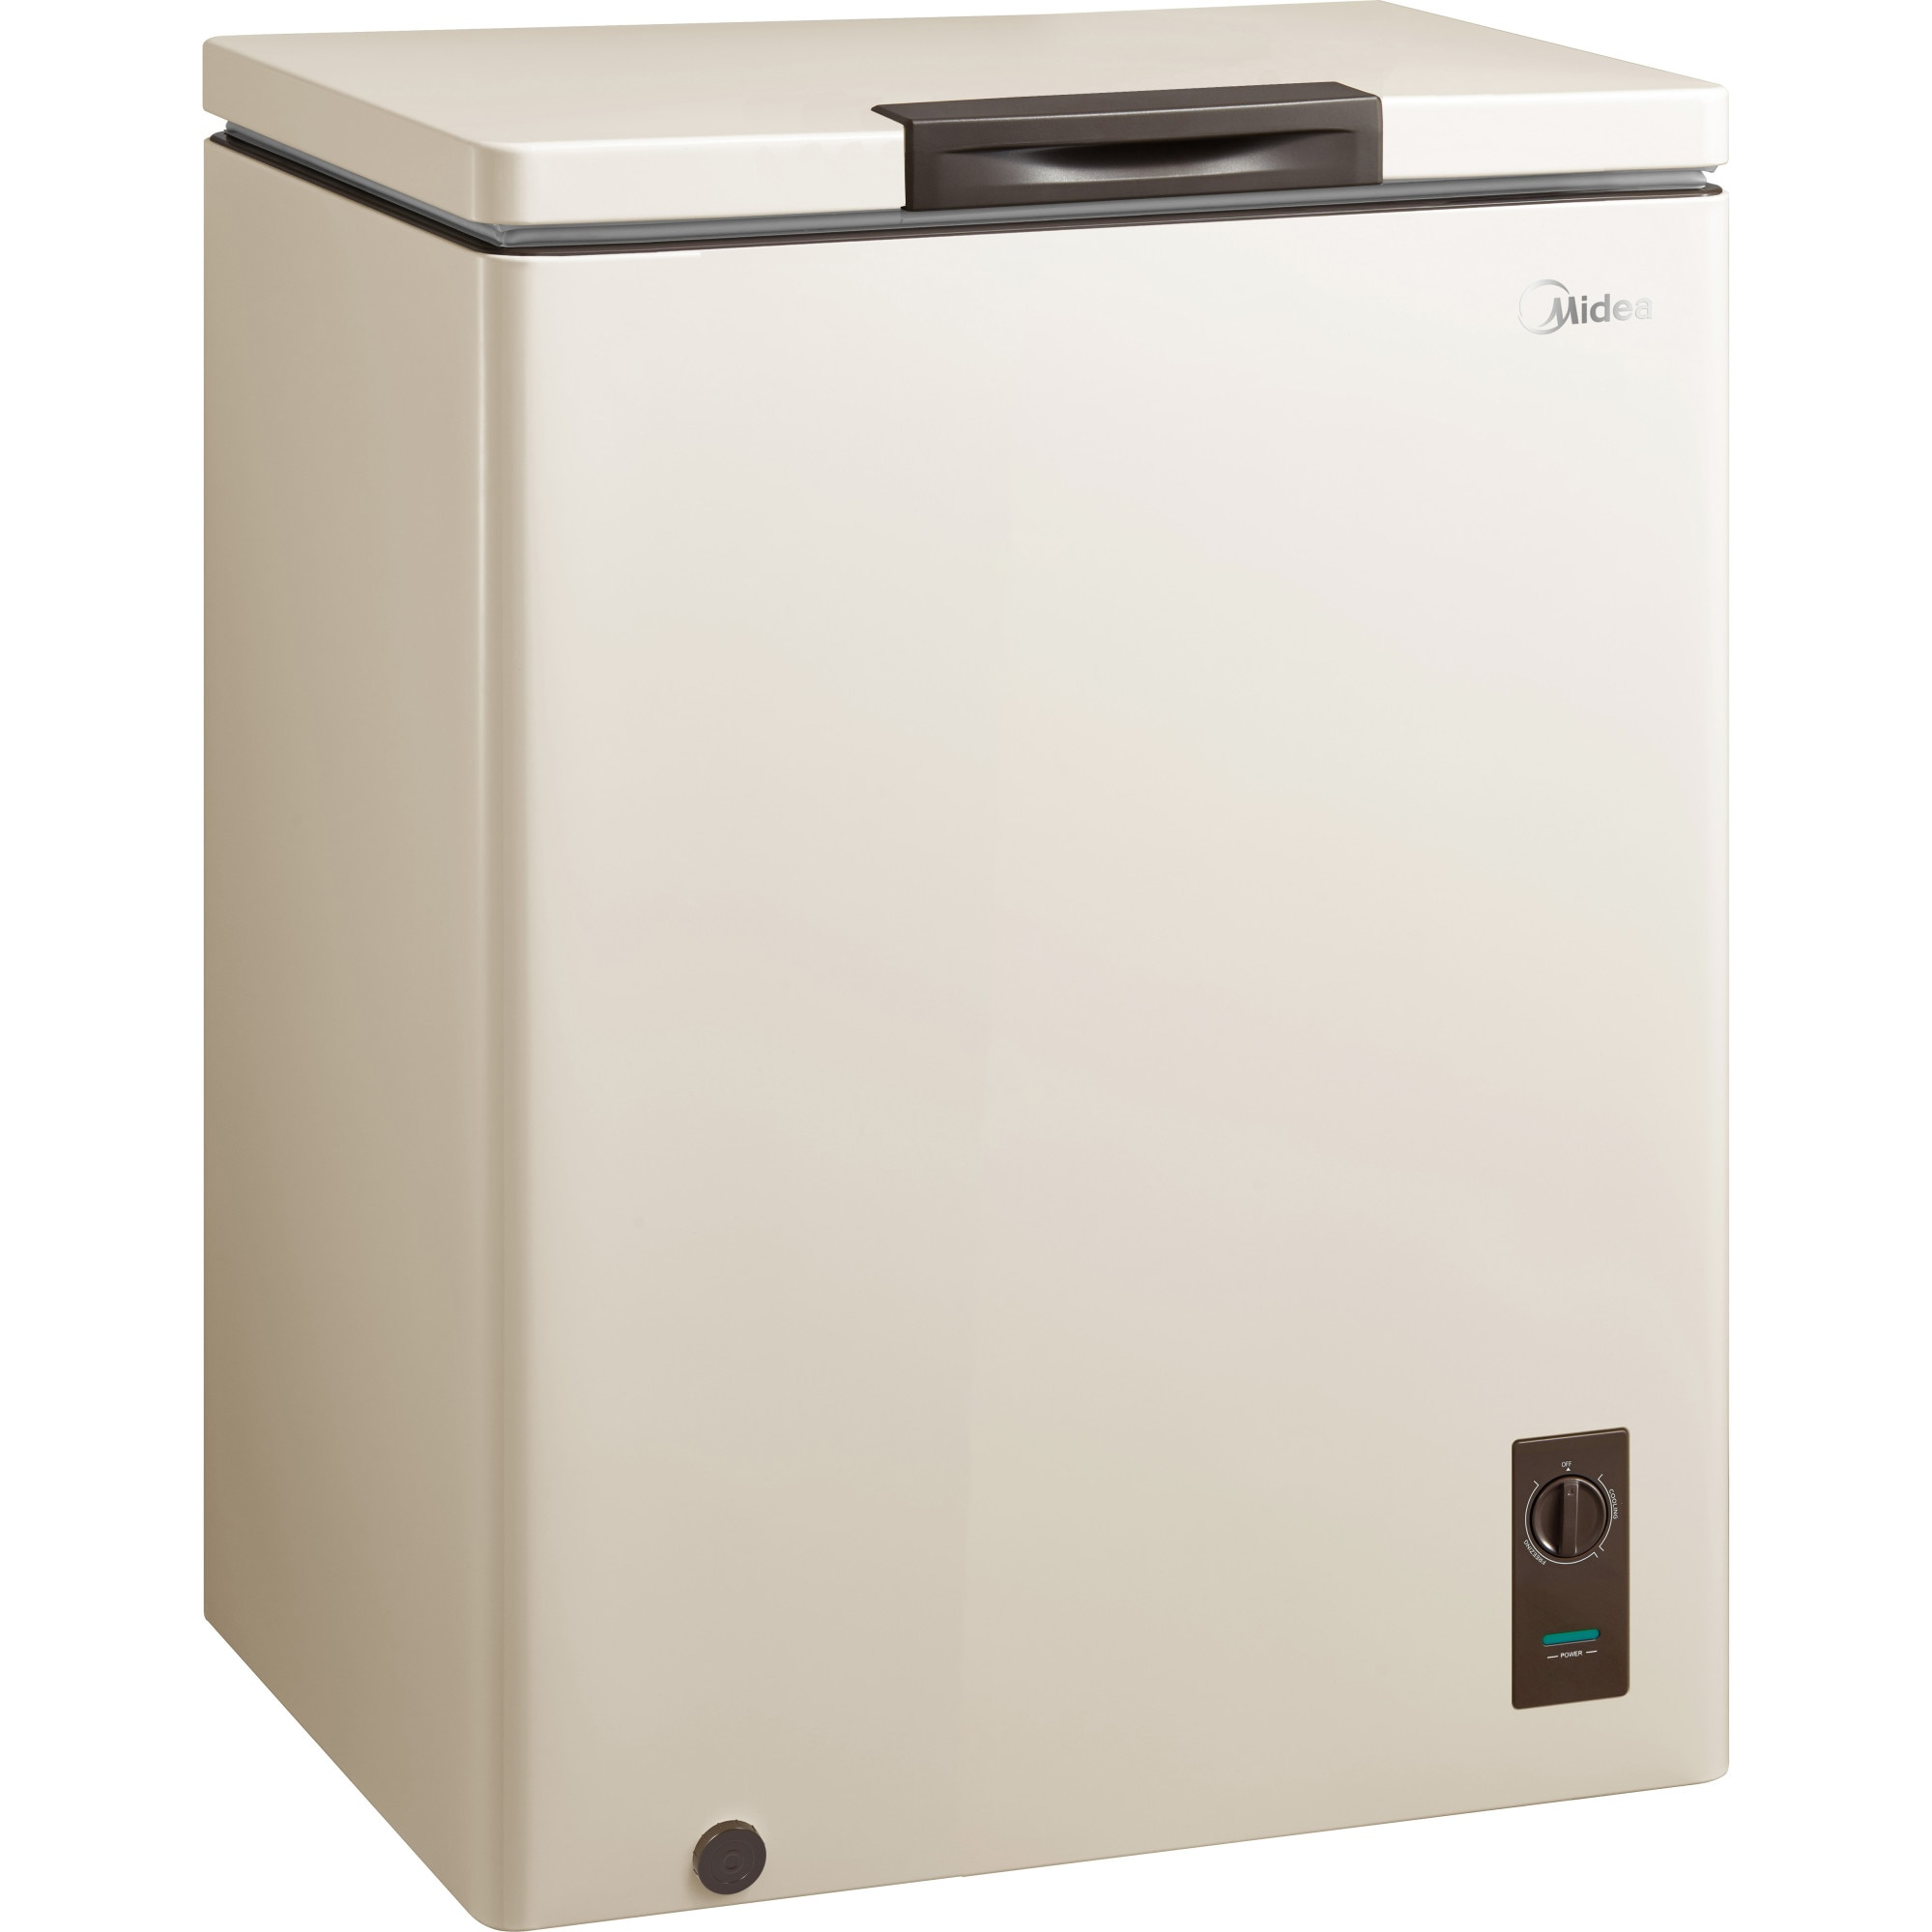 Fotografie Lada frigorifica MIDEA HS-186CNB, 142l, Functie frigider, LED, Clasa A+, Bej